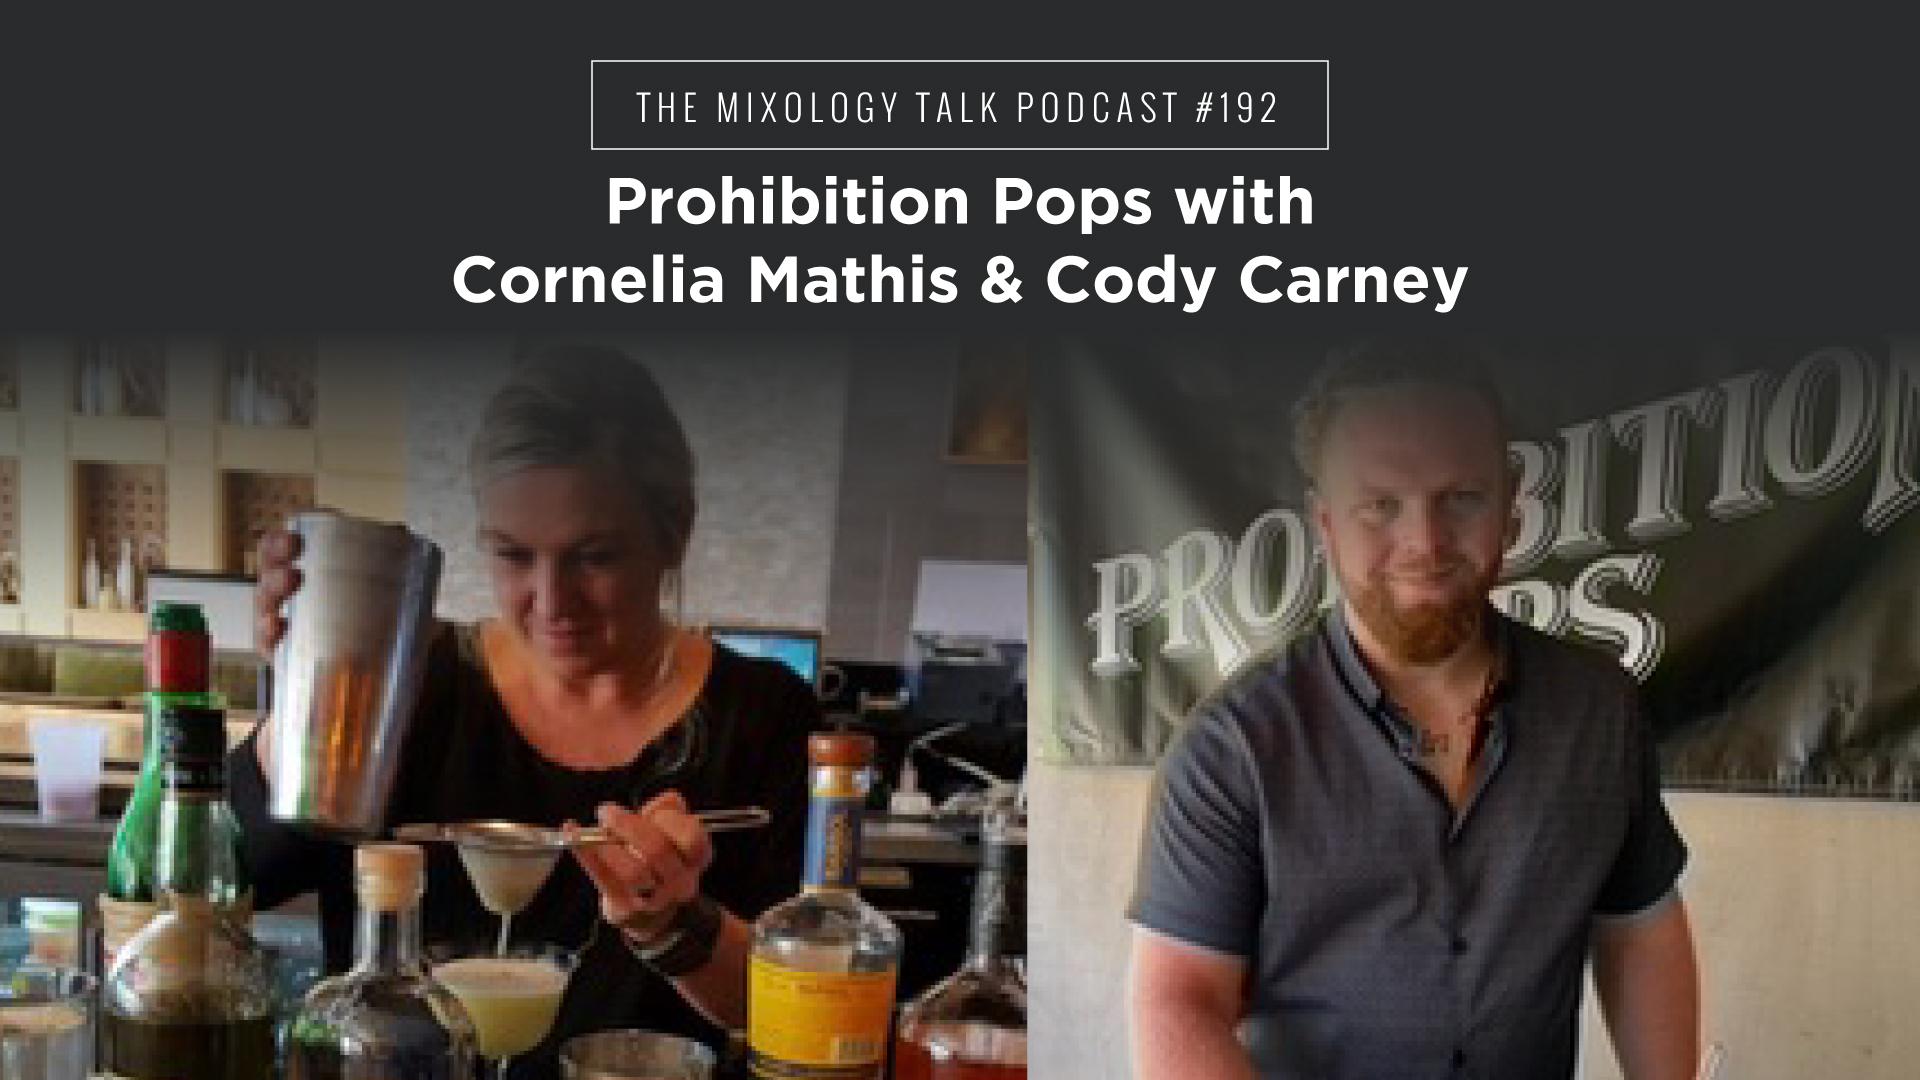 Prohibition Pops - a Pandemic Pivot